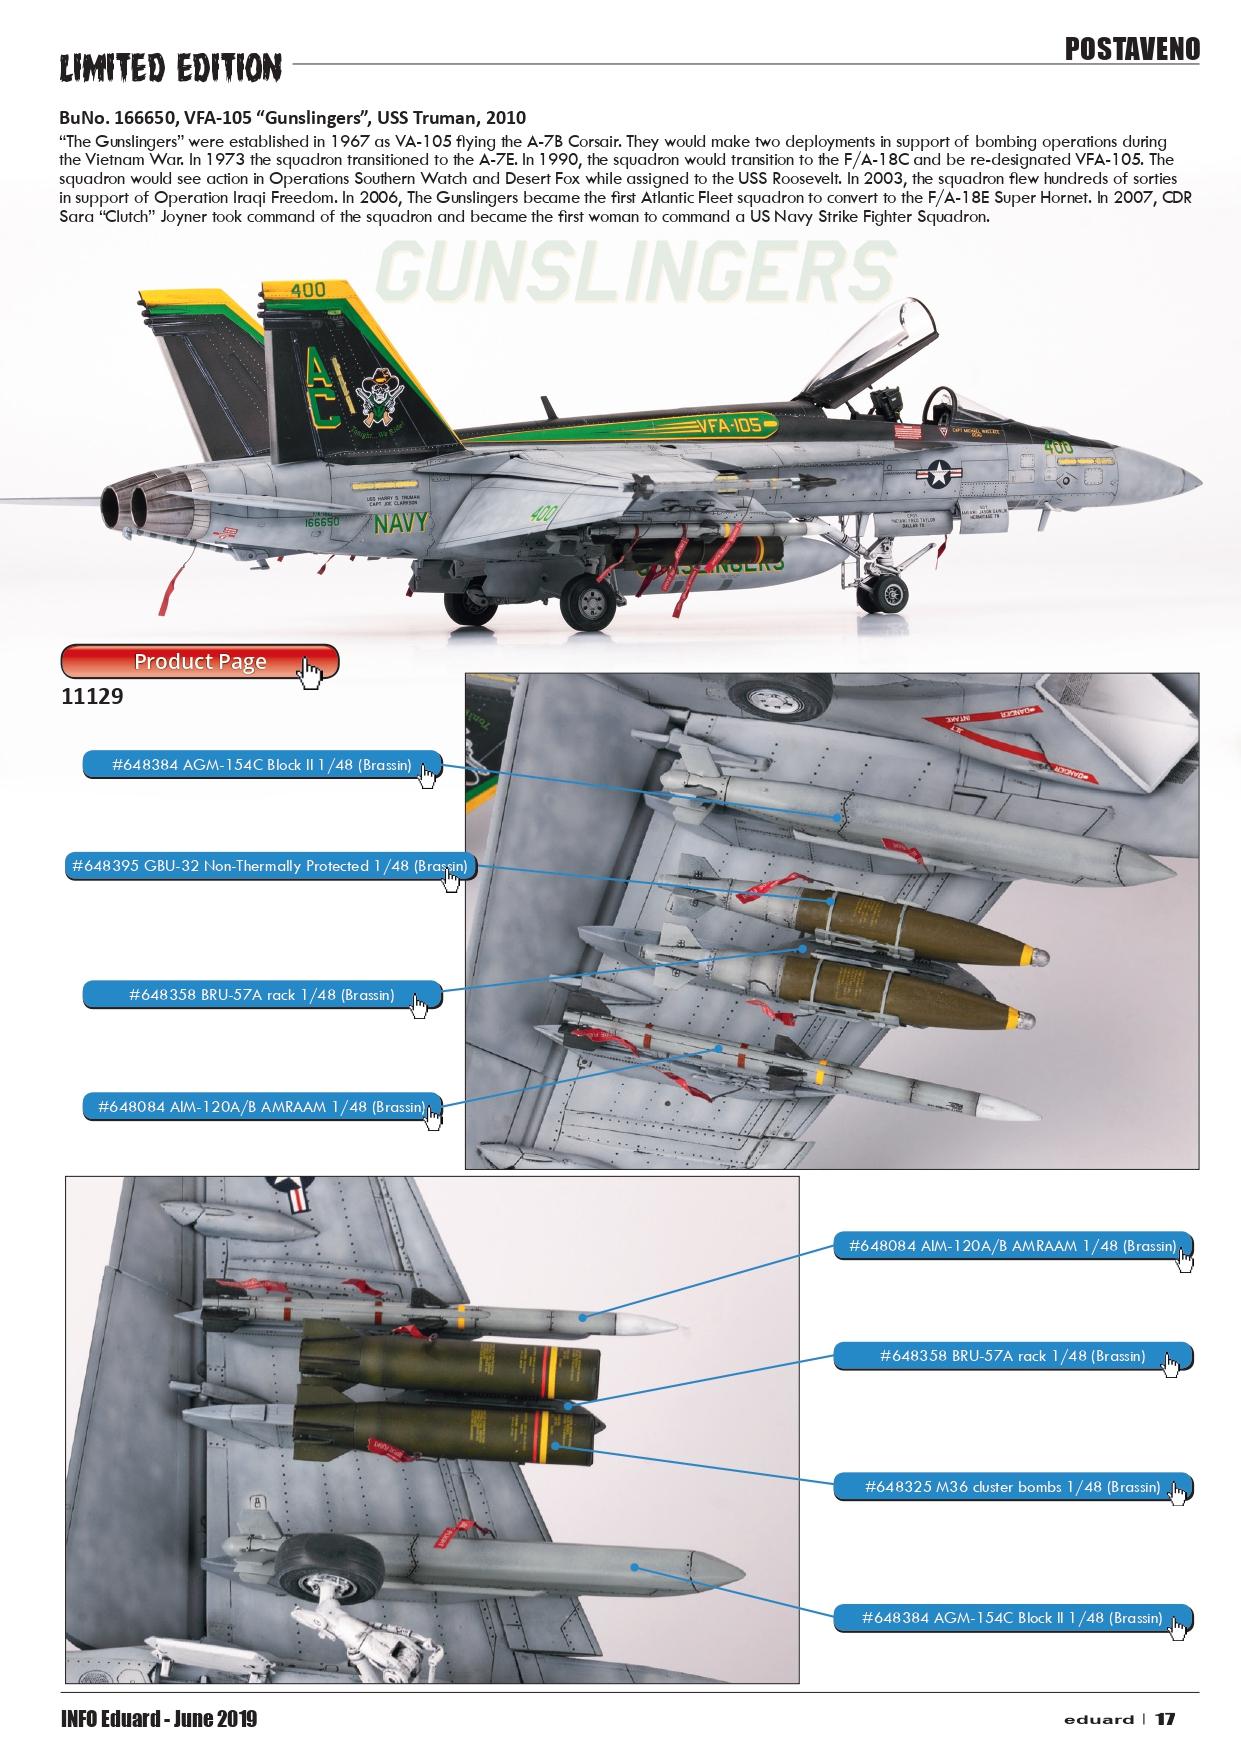 8pcs Eduard Brassin 648395 1//48 GBU-32 Non-Thermally Protected Bombs